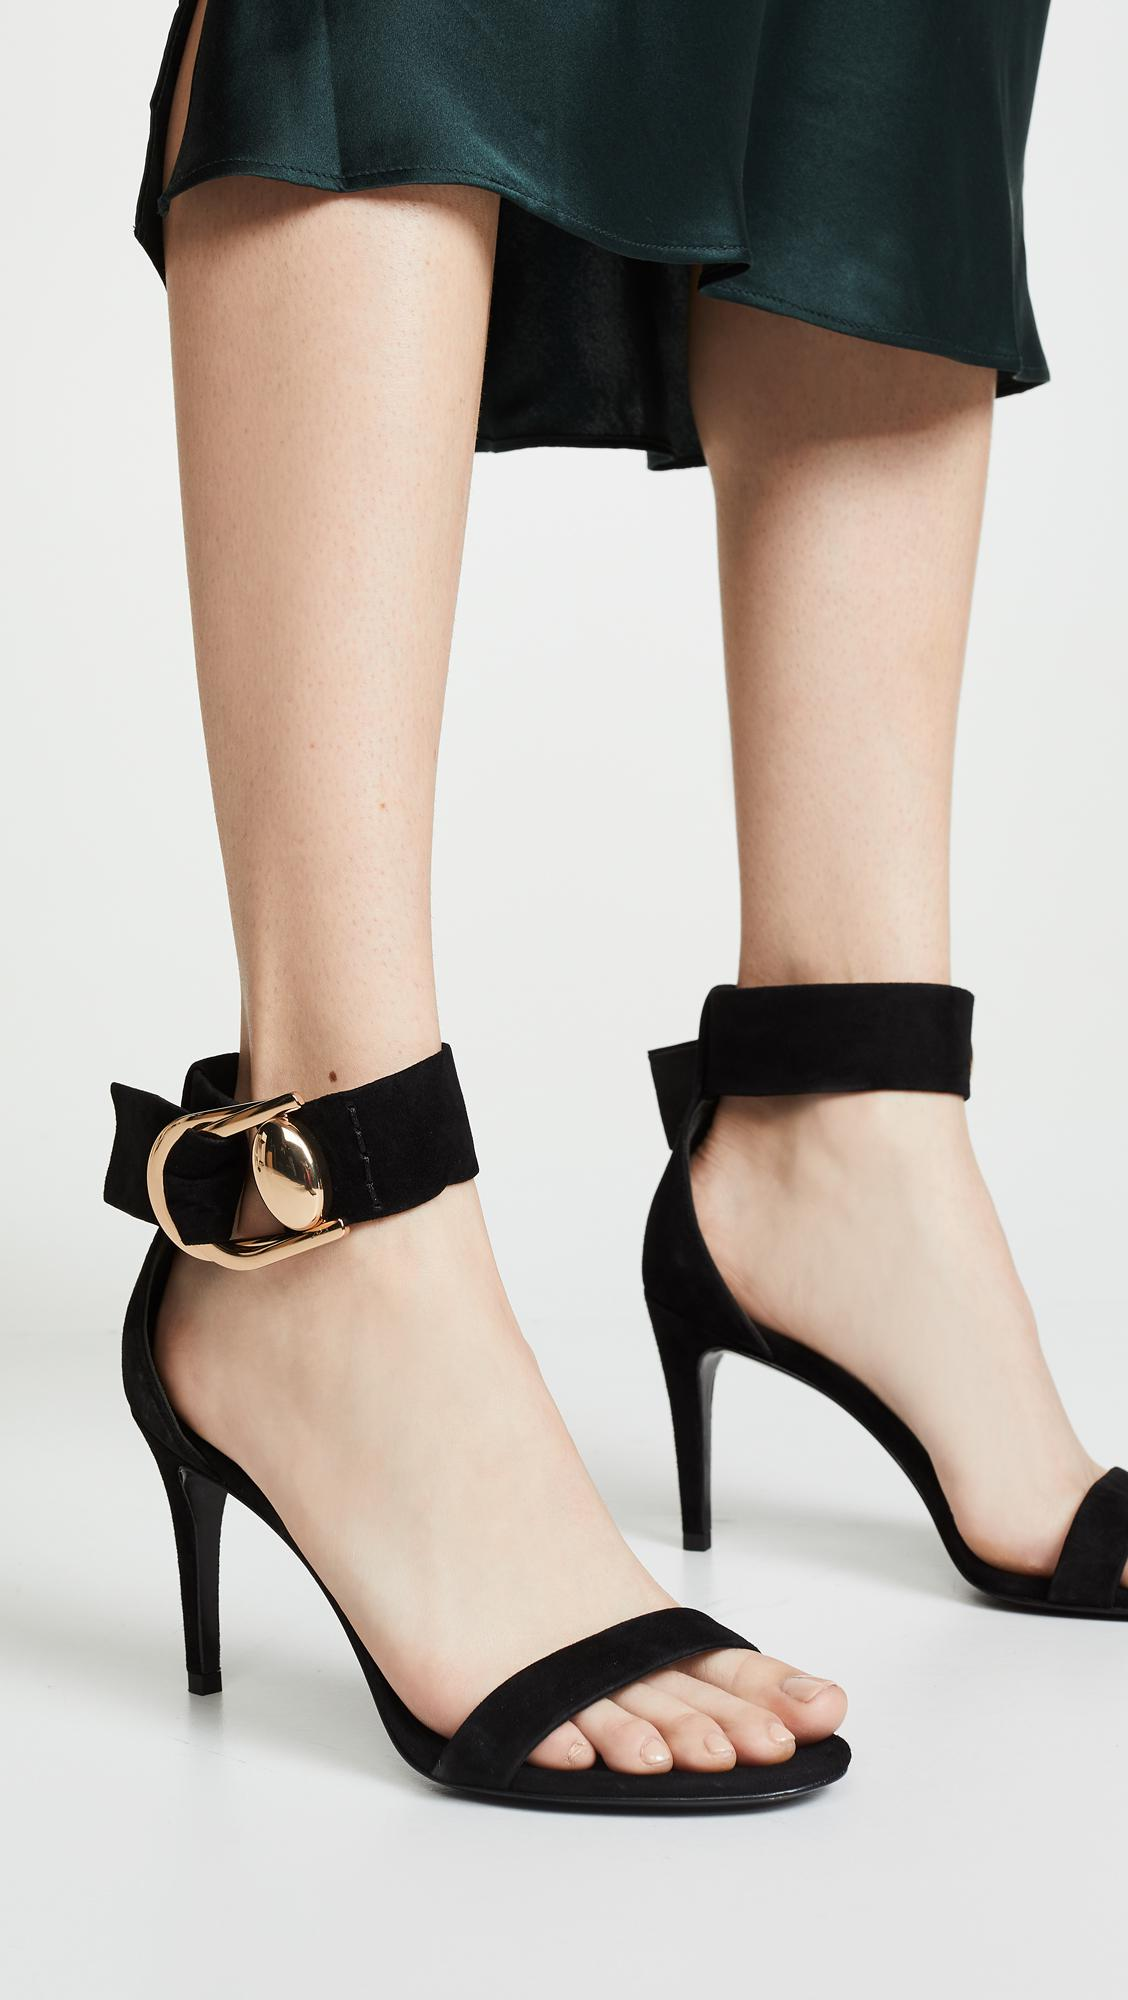 5322f5d42fbf1 Stella Luna Double-ring Sandals in Black - Lyst